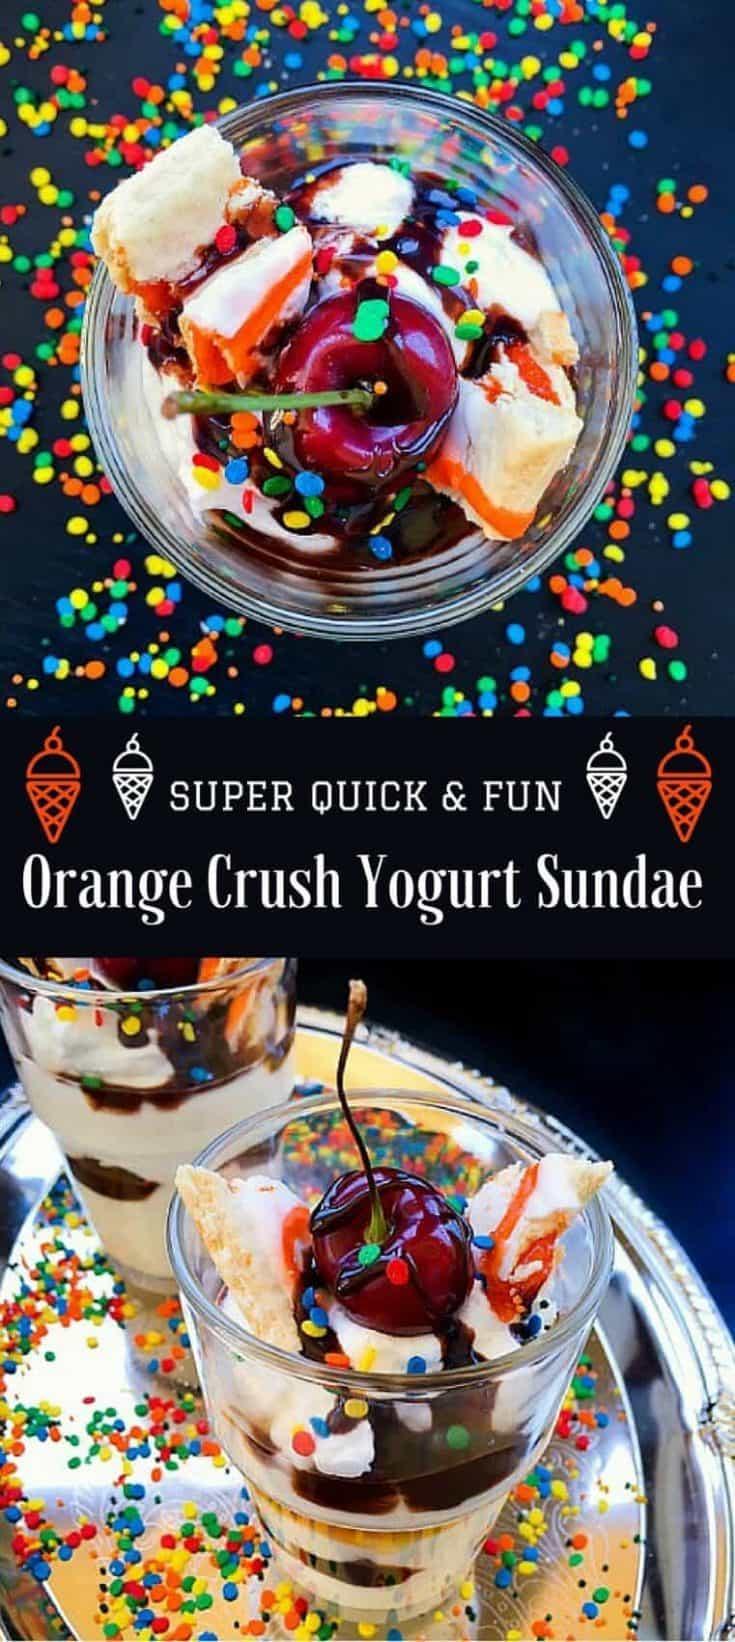 Pop Tart Sundae : #poptart #sundae #afterschool #ReimagineCereal #CollectiveBias #yogurt #sundae